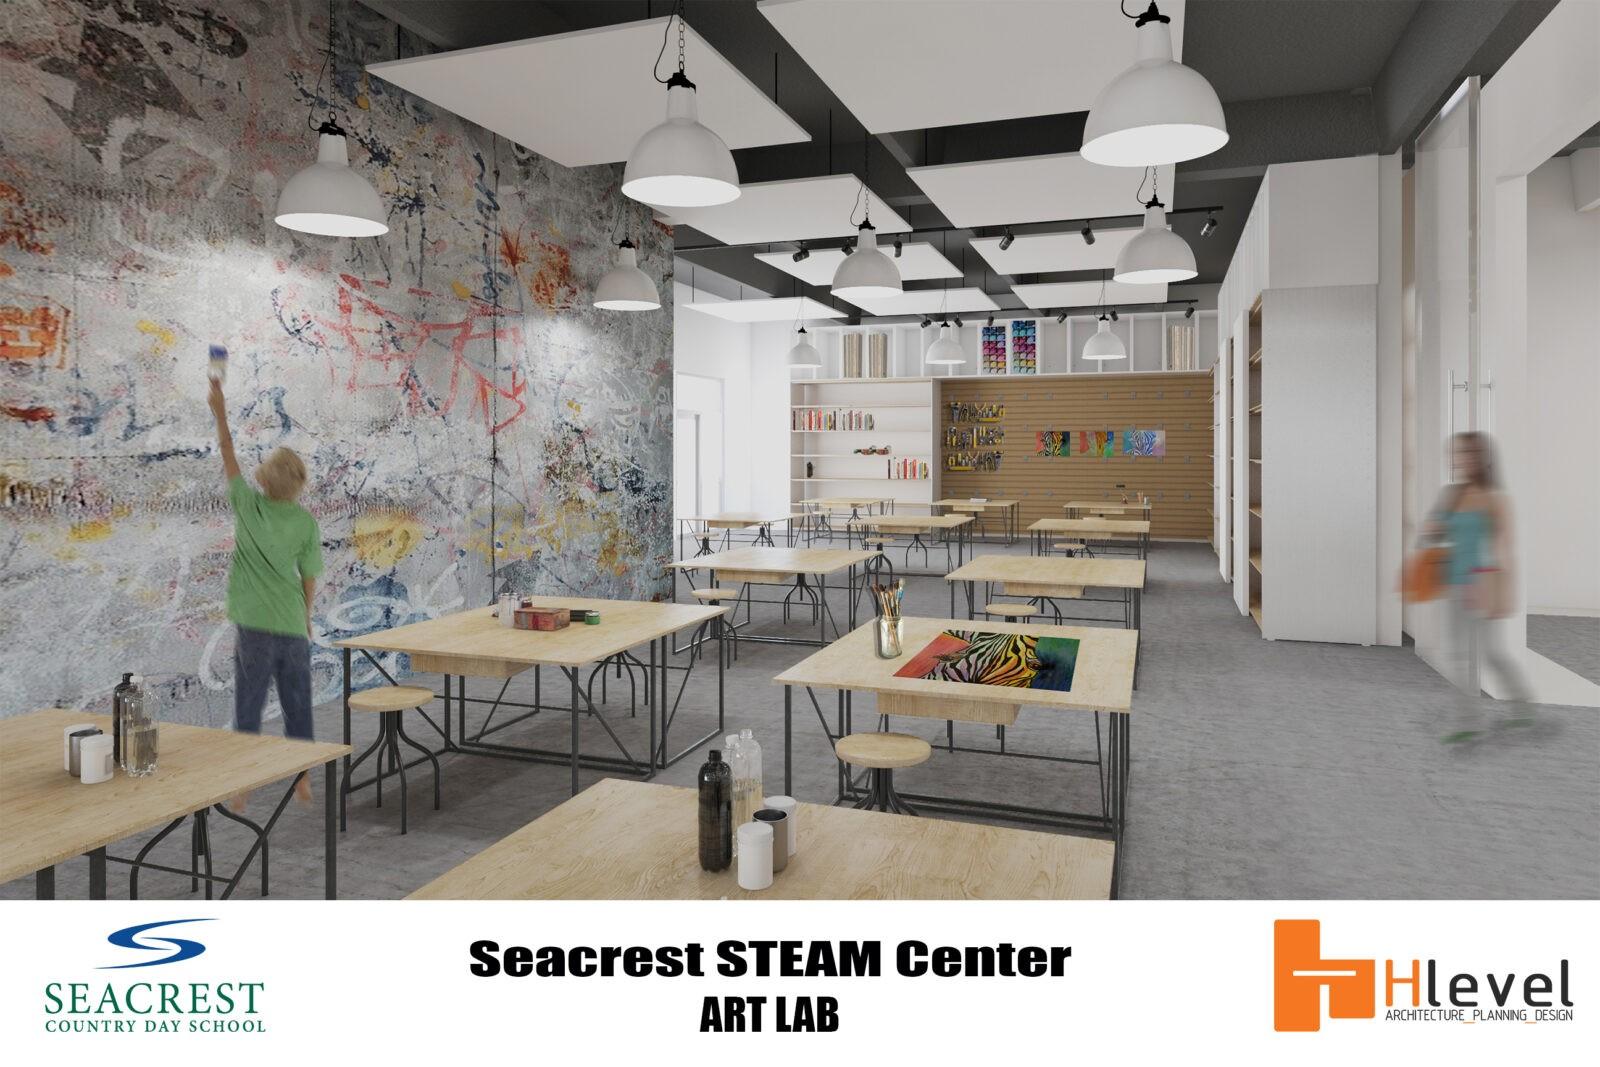 Seacrest Makerspace